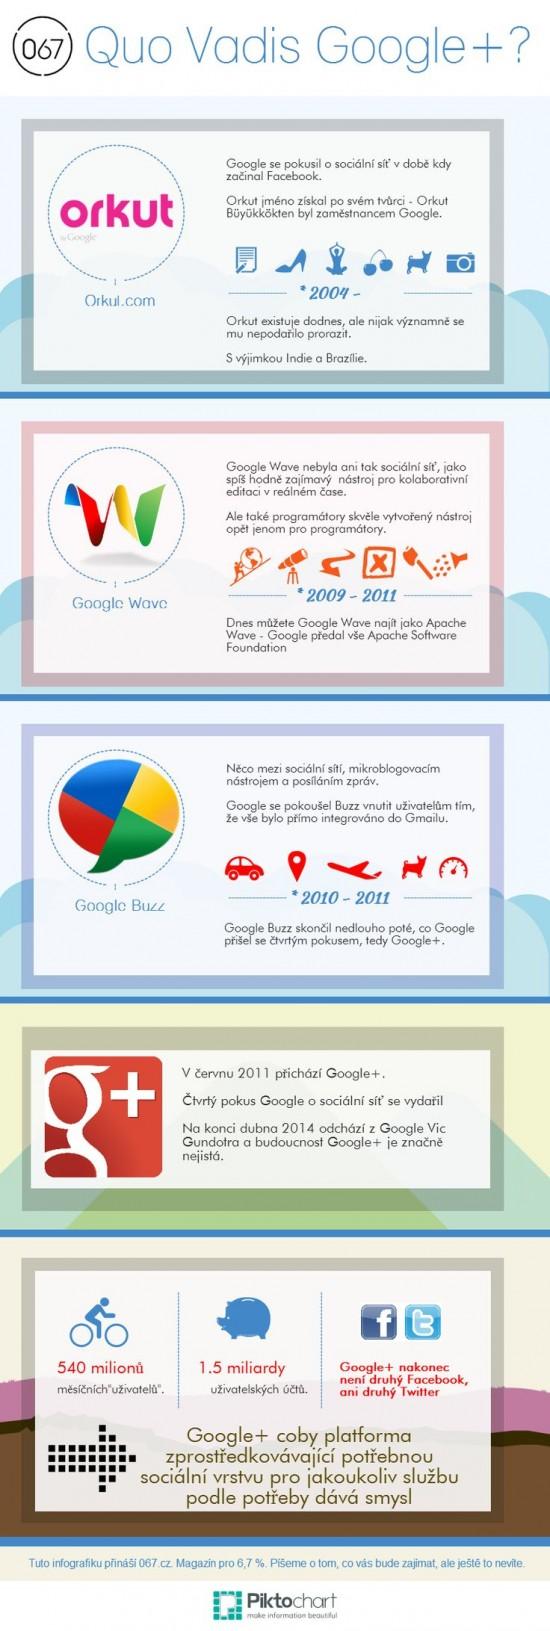 Quo Vadis GooglePlus - infografika